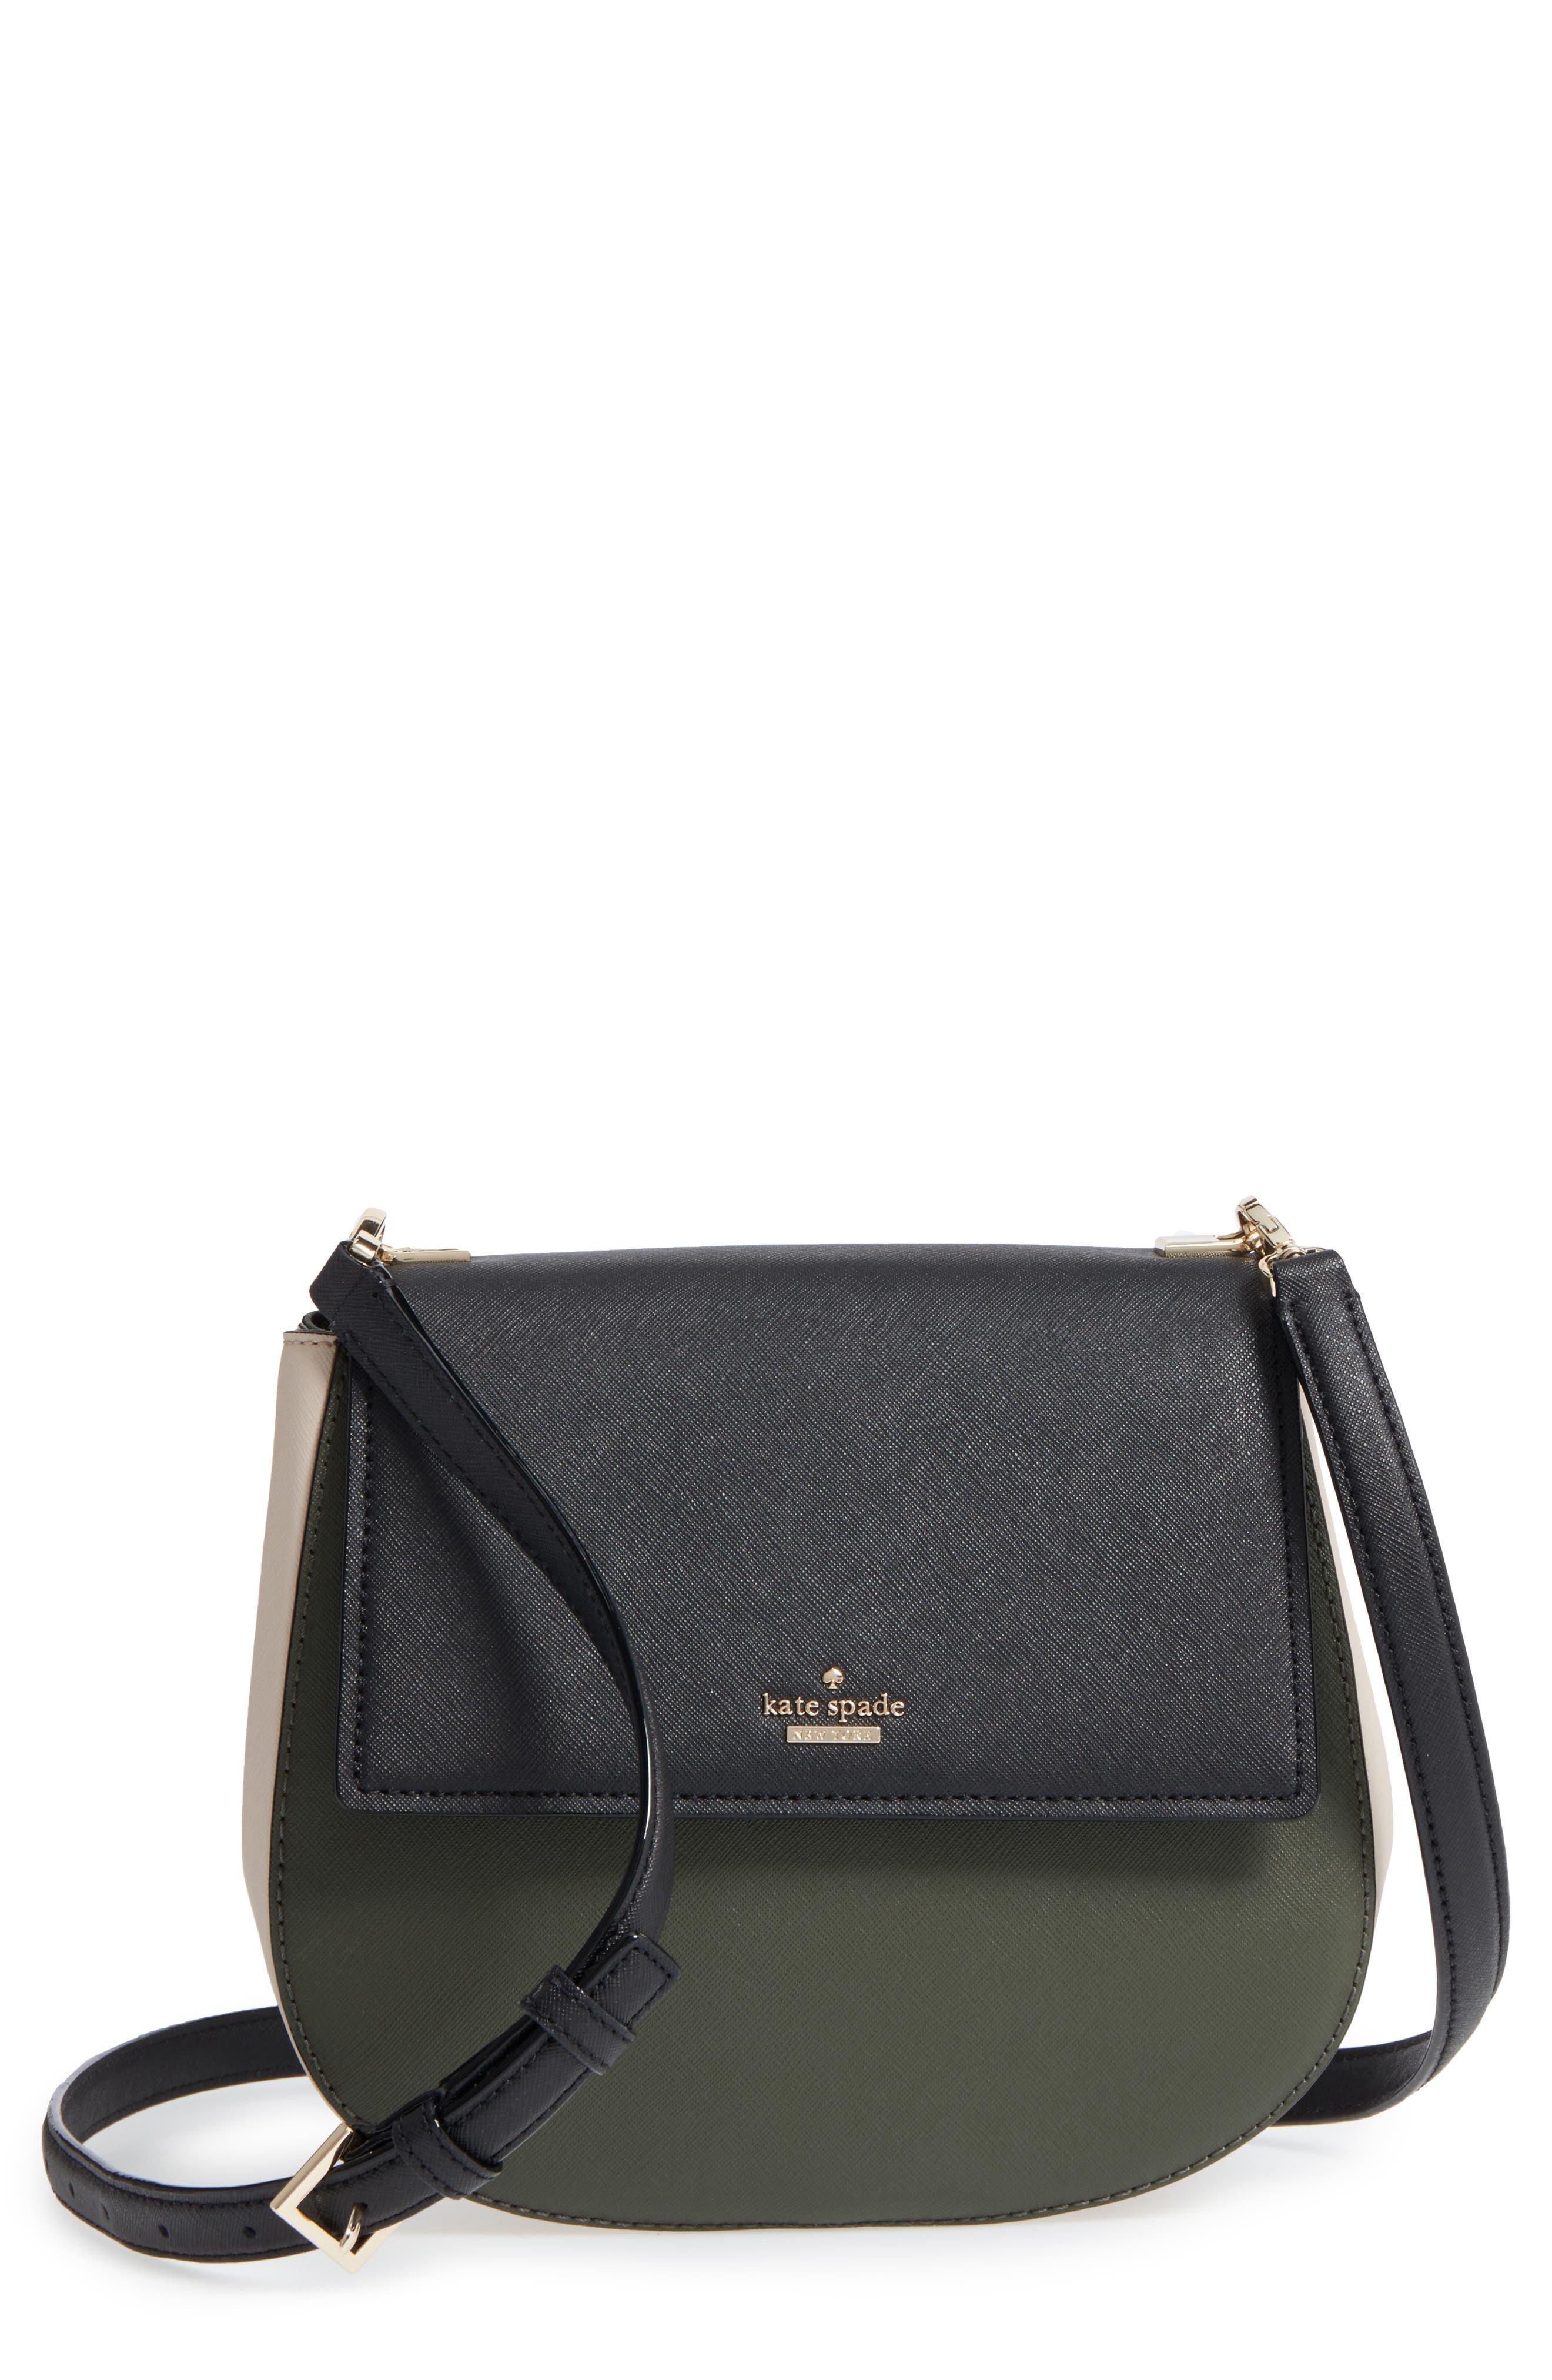 Main Image - kate spade new york cameron street - byrdie leather crossbody bag